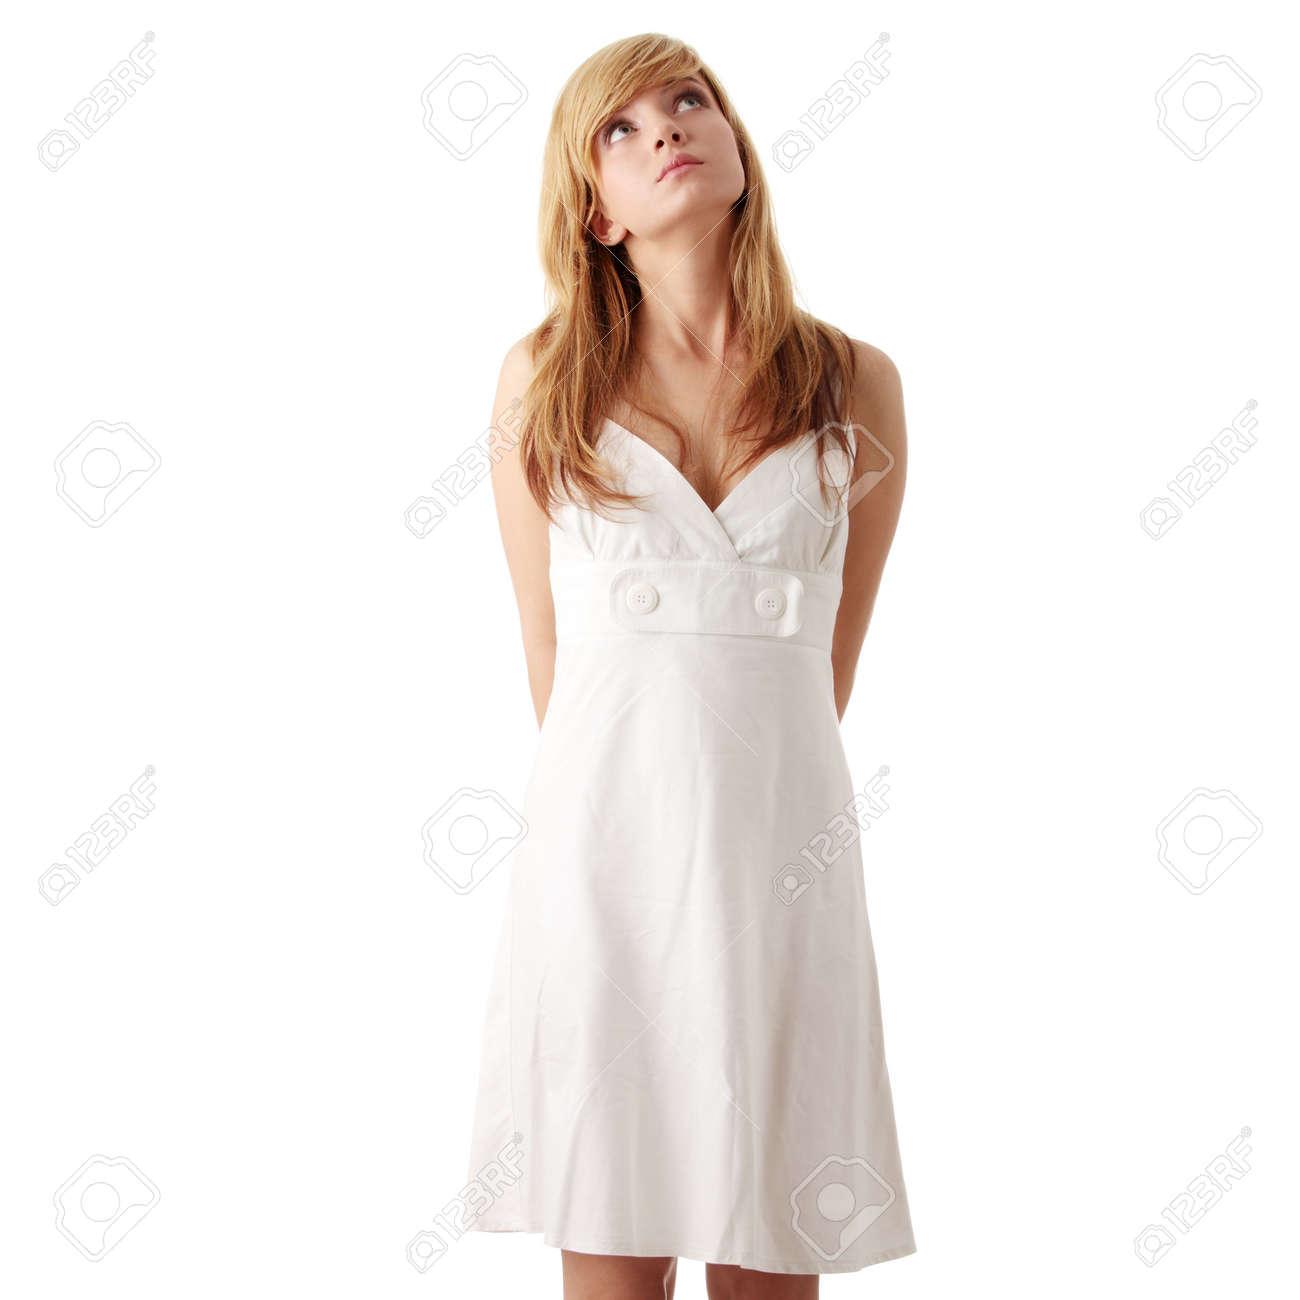 gedetailleerde look enorme selectie van outlet verkoop Teen meisje in witte jurk, geïsoleerd op witte achtergrond